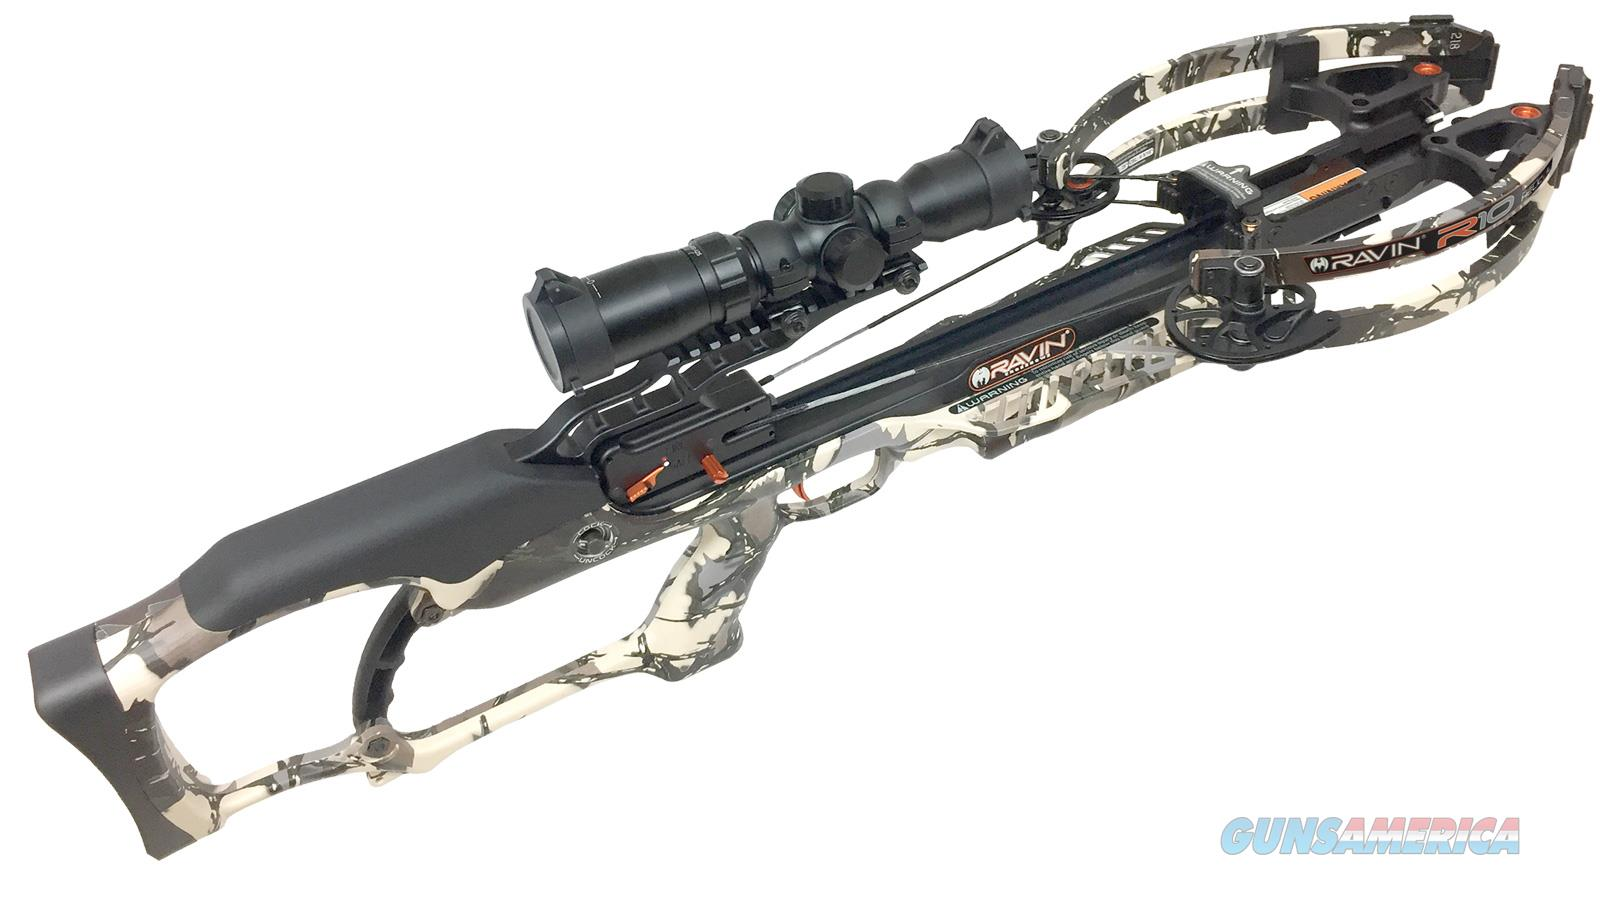 Ravin Crossbows Crossbow R10 Predator Camo R010  Non-Guns > Archery > Bows > Crossbows